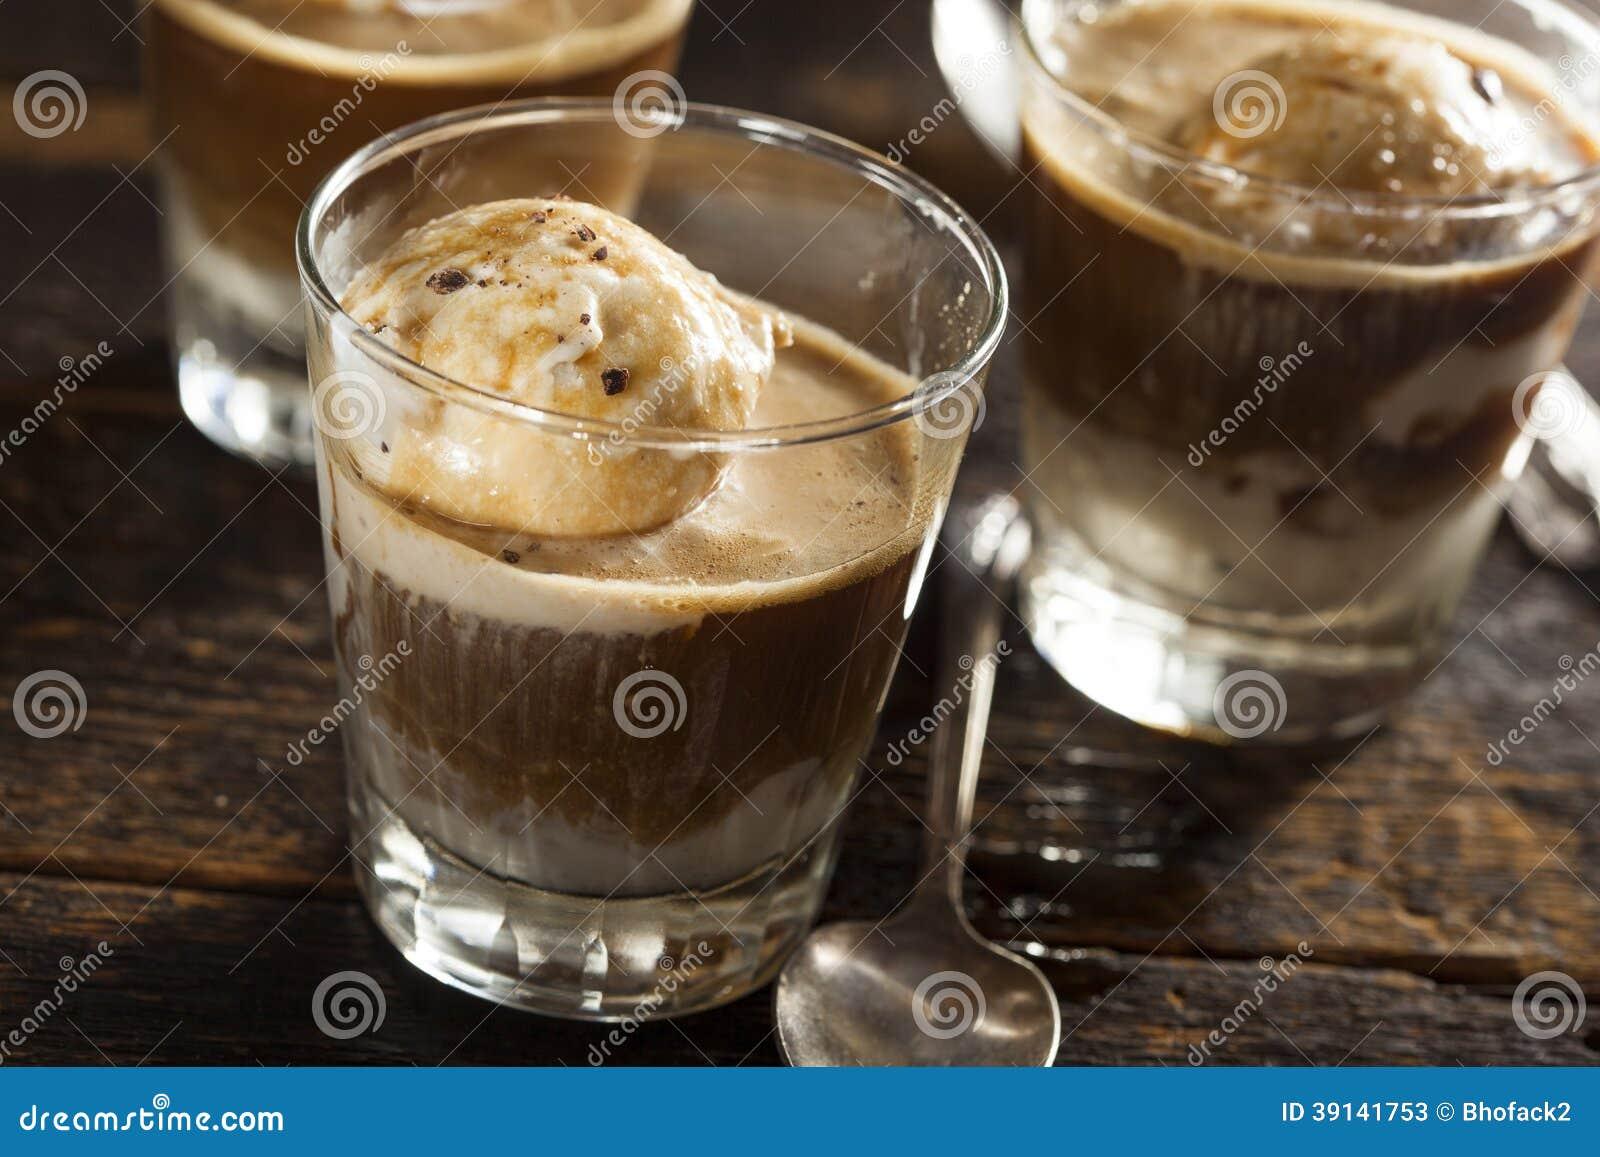 Homemade Affogato with Ice Cream